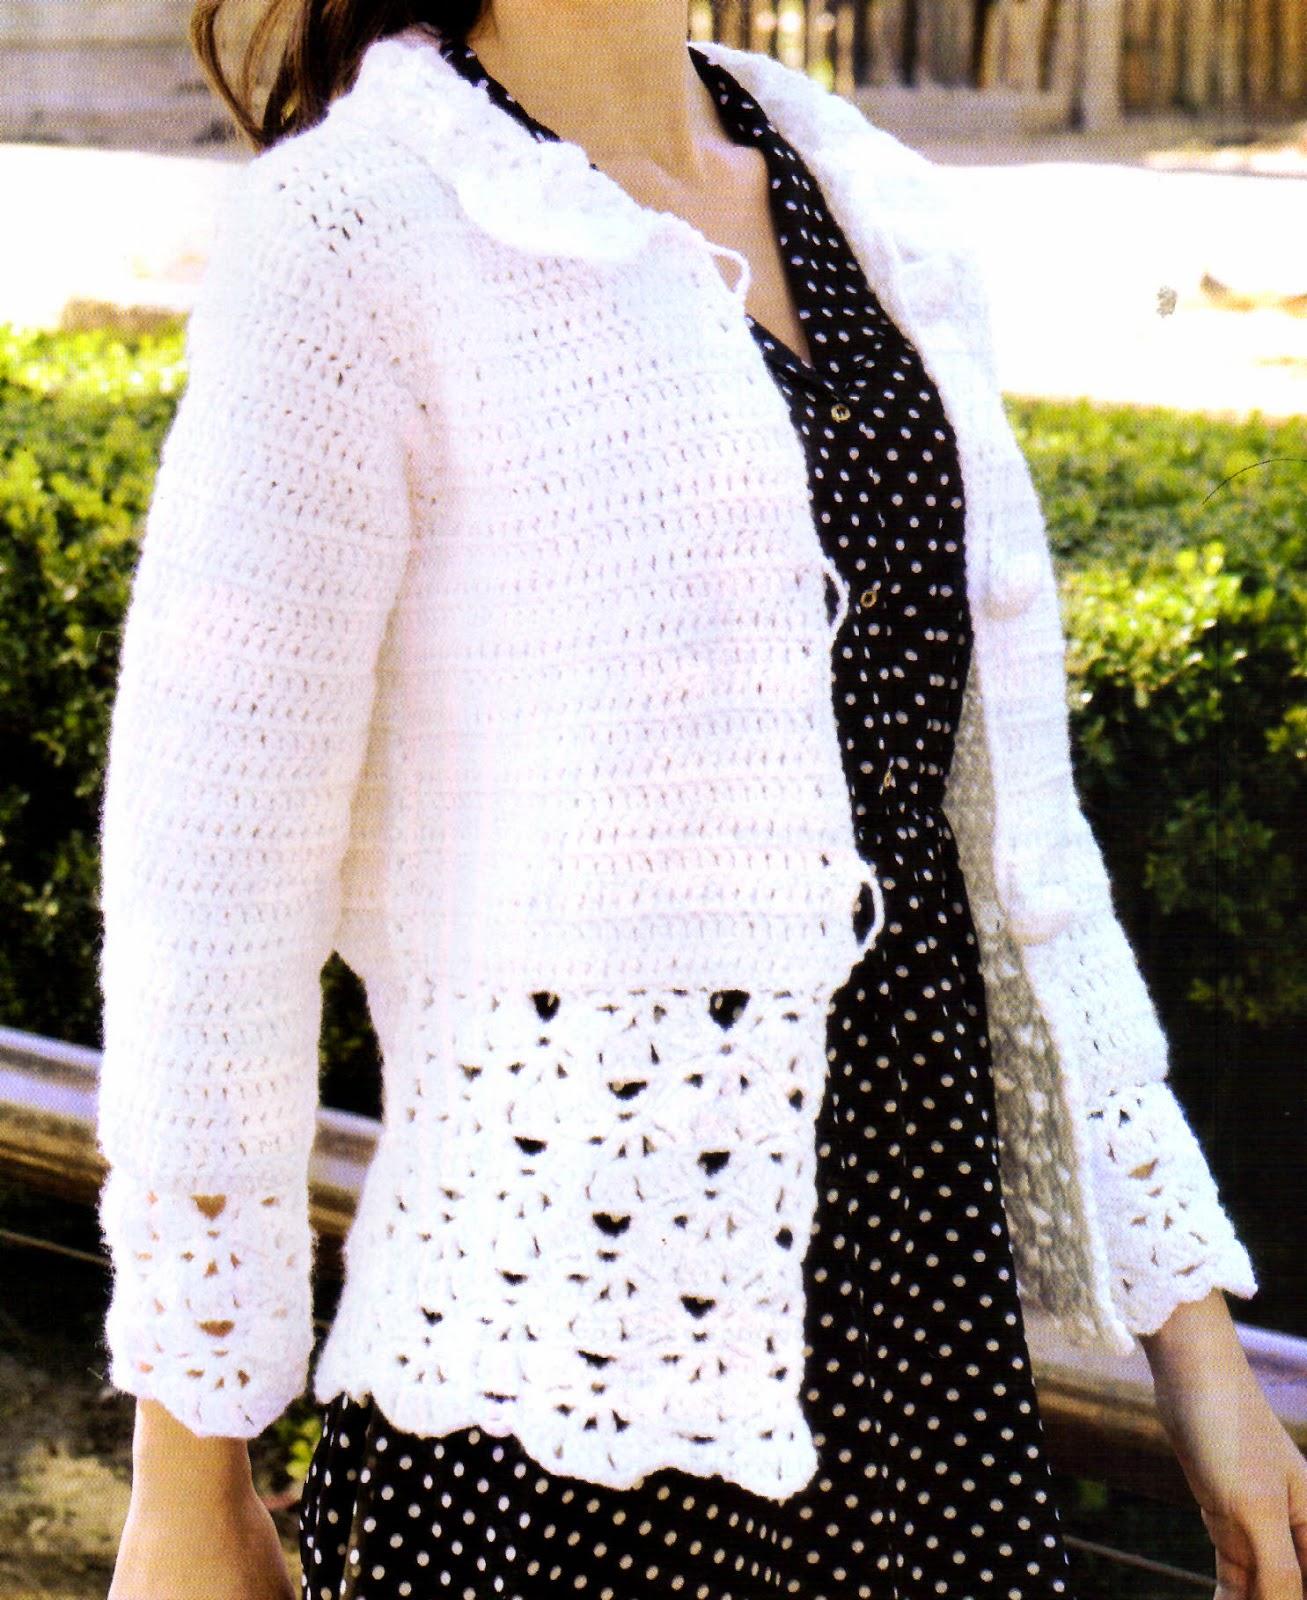 saco tejido en crochet con un bonito detalle (frente)